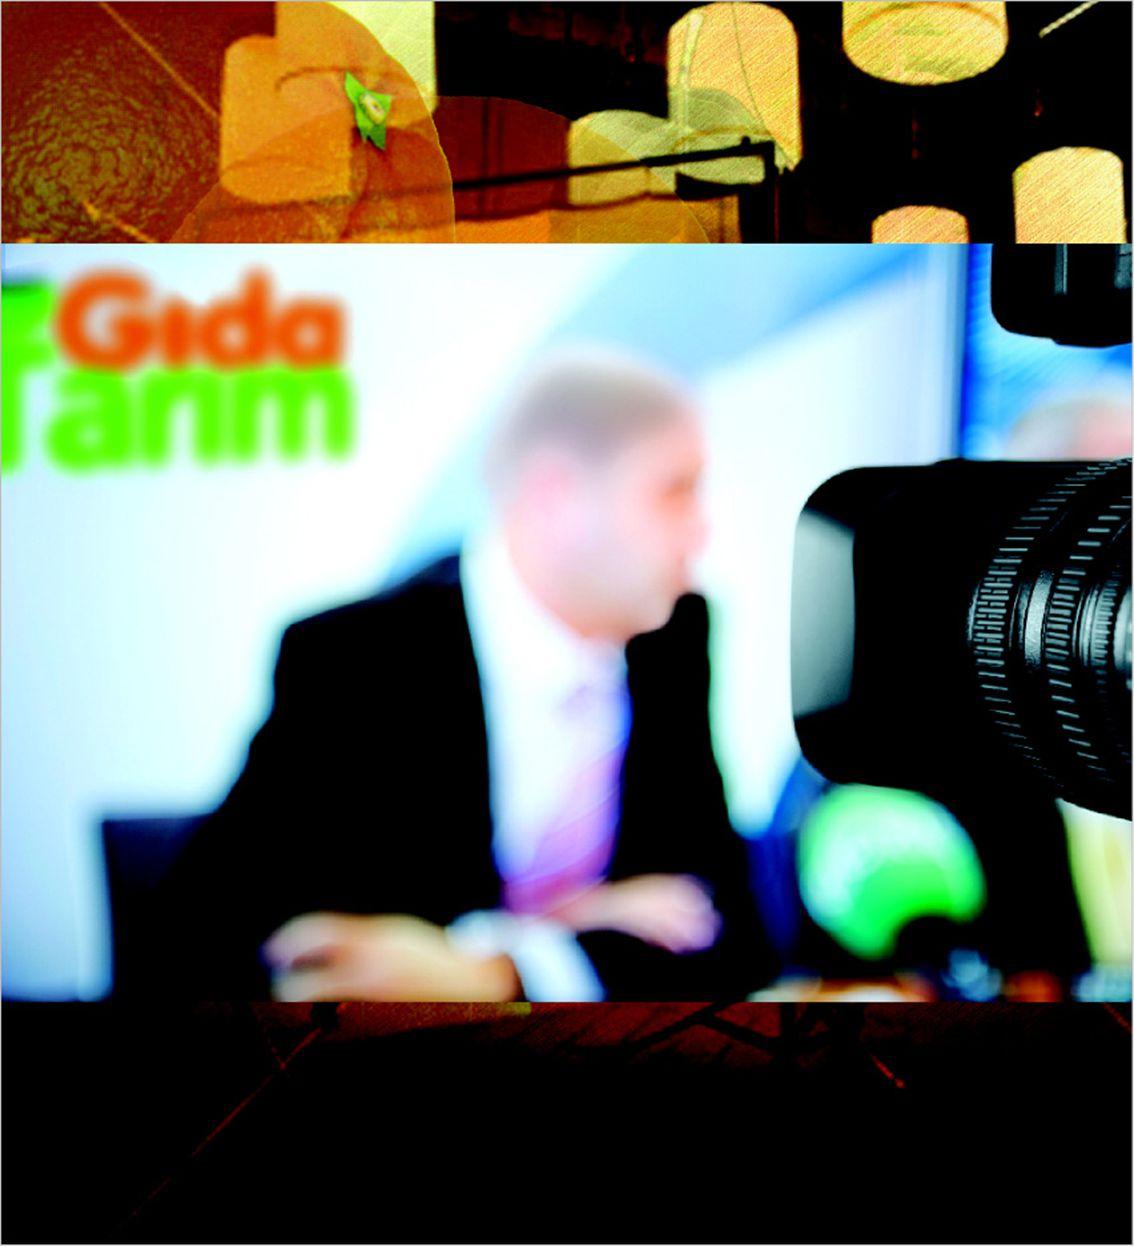 İNTERNET TV ULUSAL TV VİDEOLAR MEDYADA GIDA TARIM